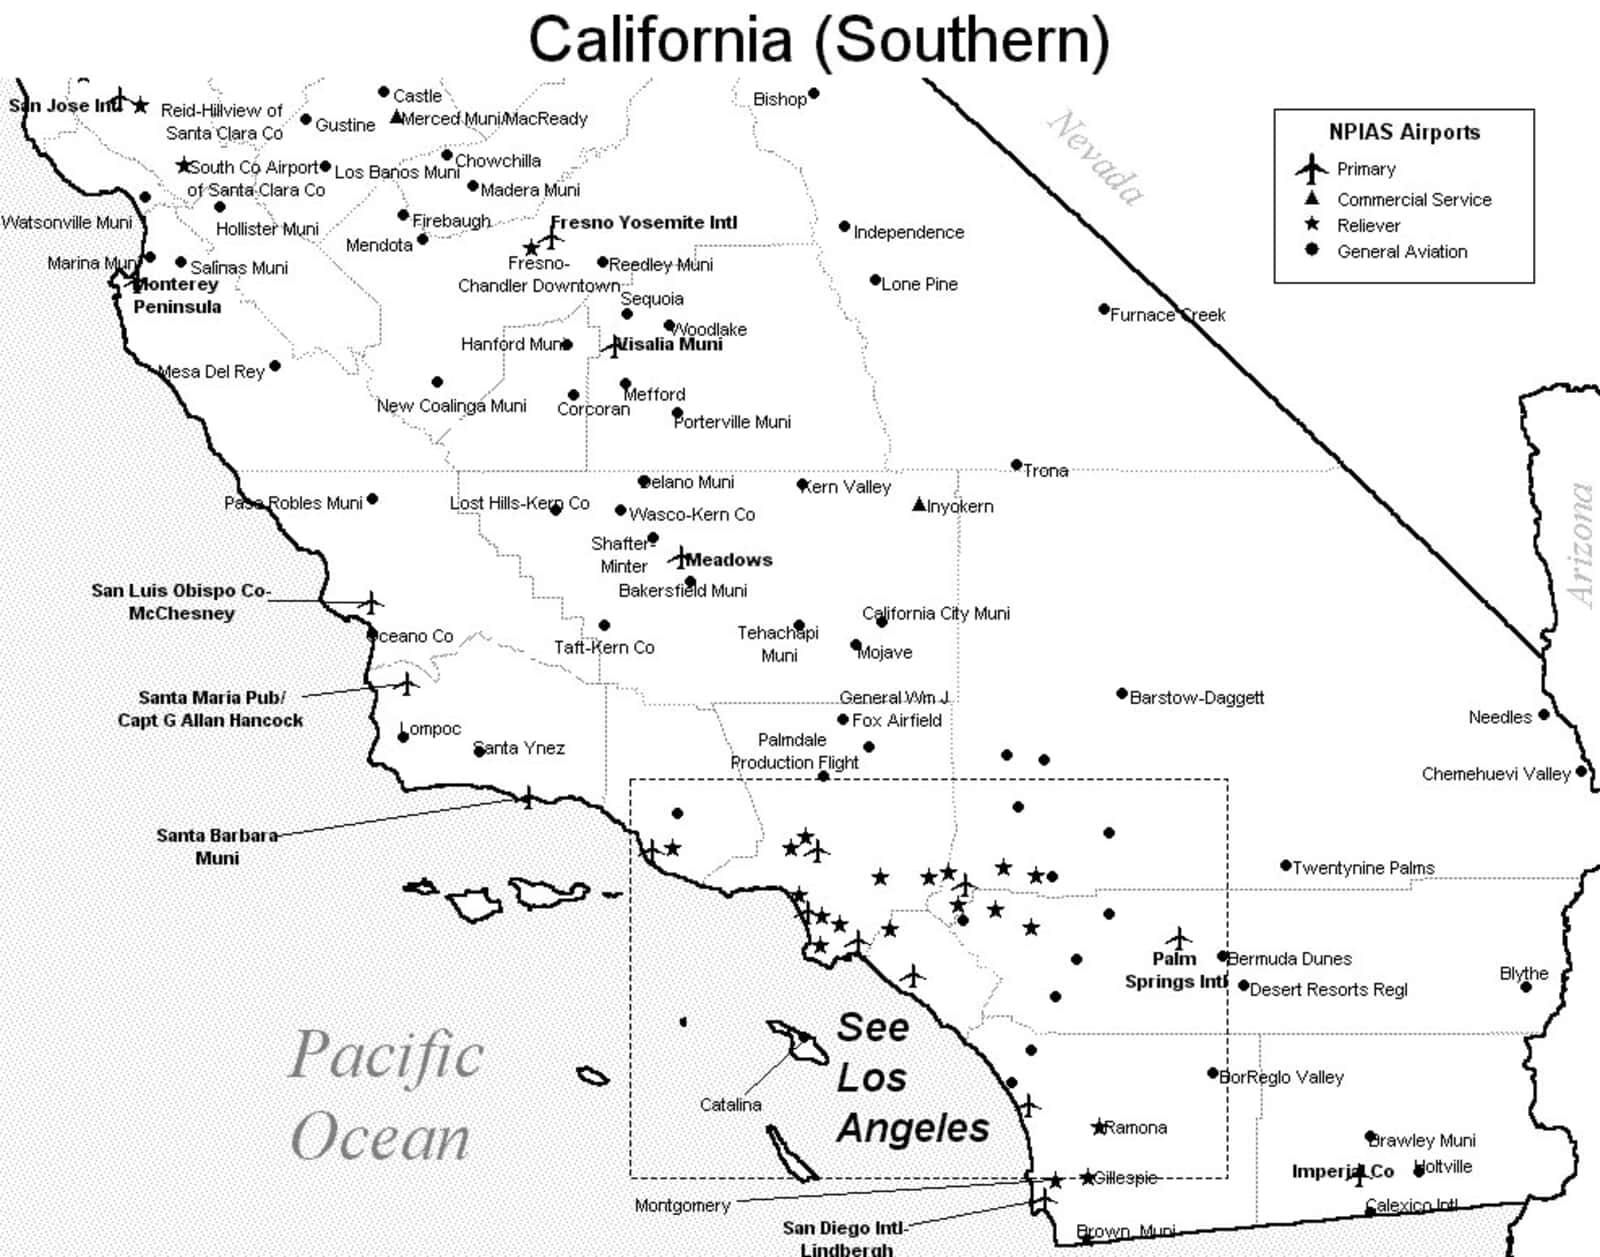 Southern California Airport Map - Southern California Airports